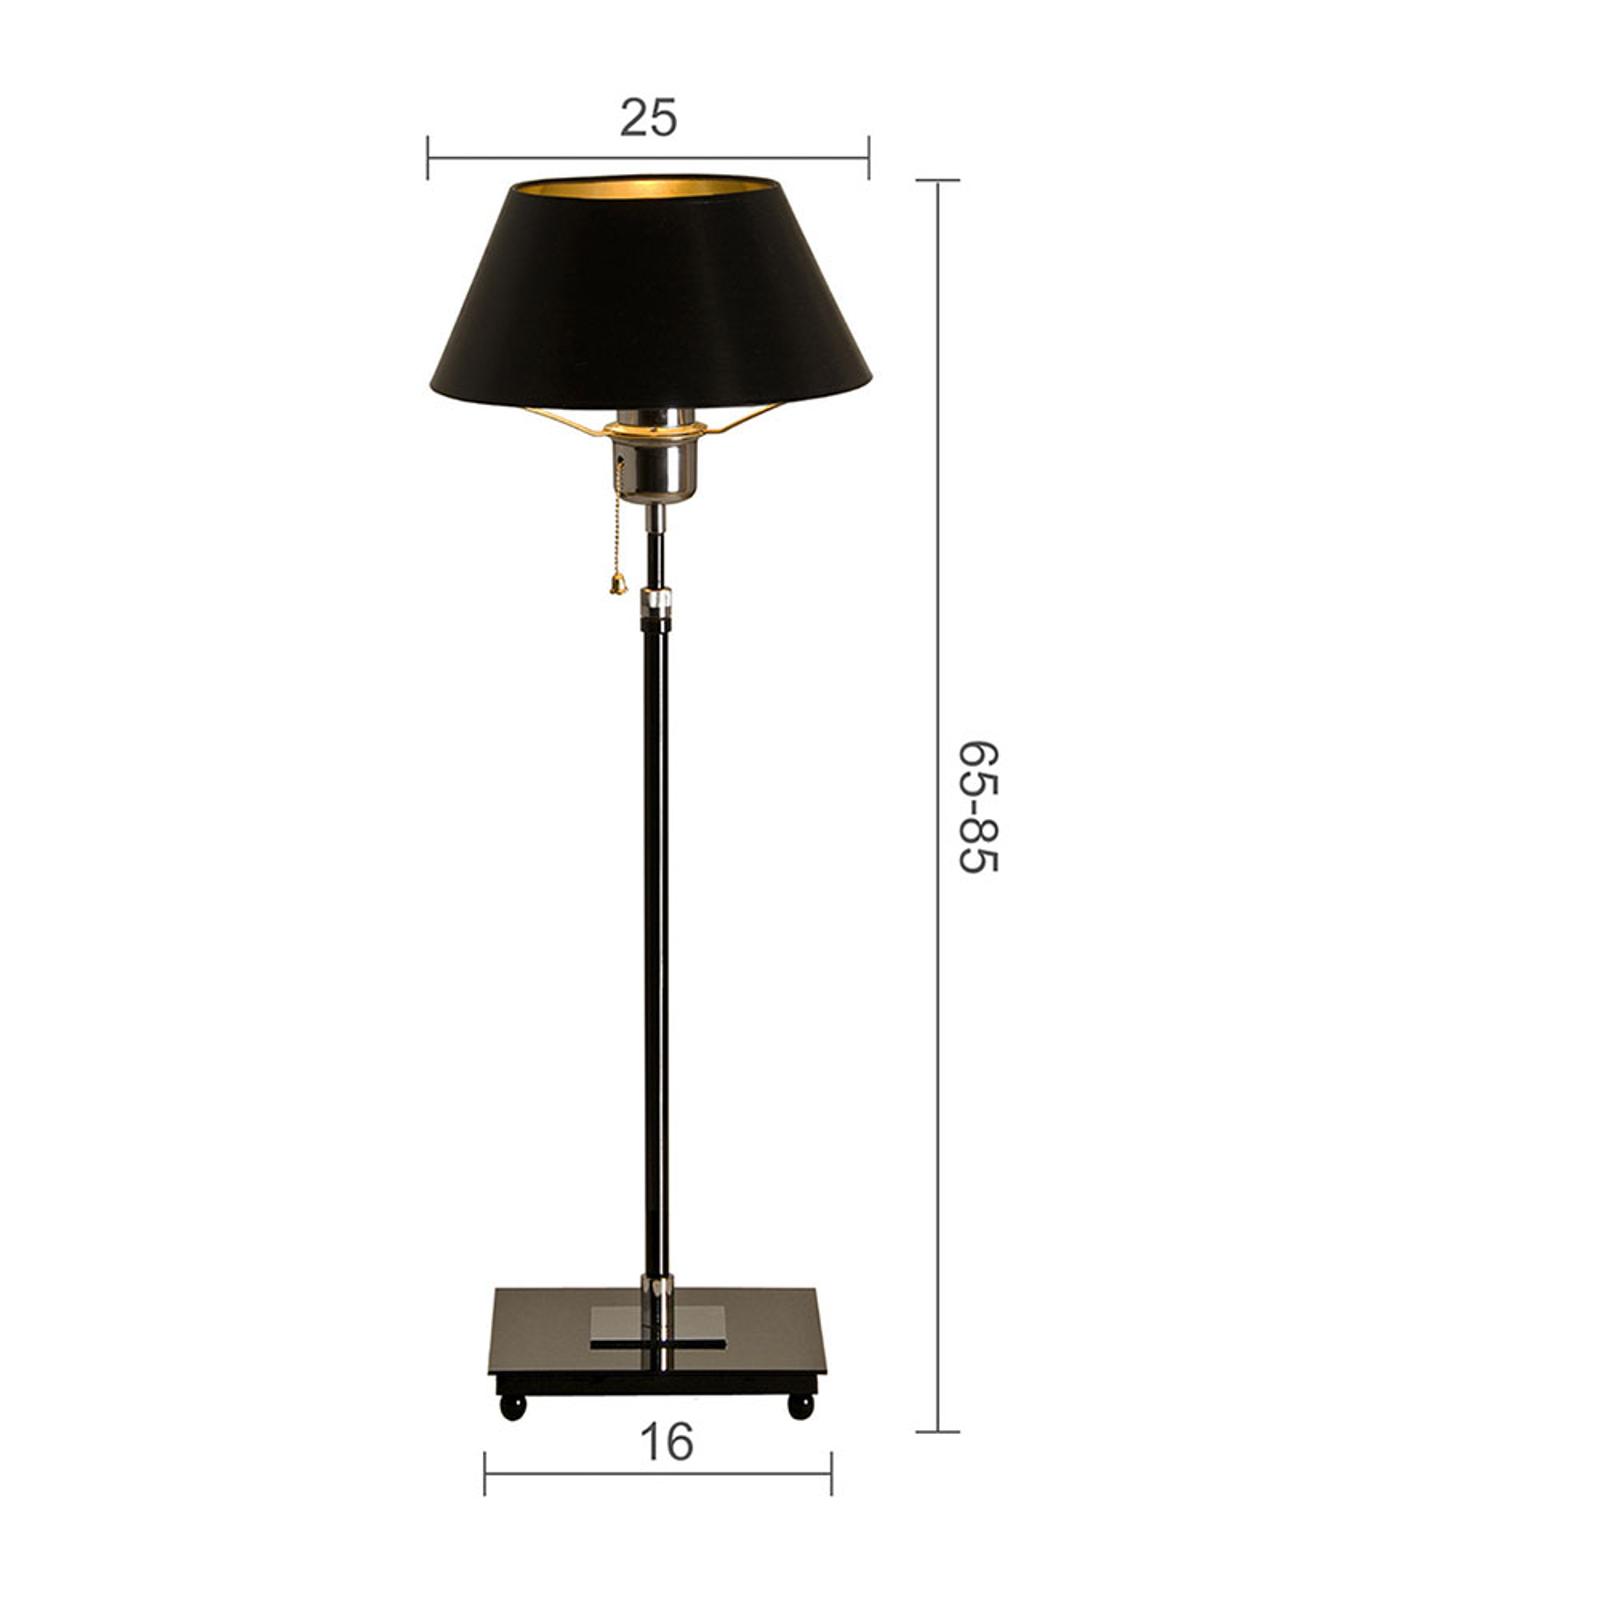 Menzel Antos AF4125 tafellamp, kap zwart